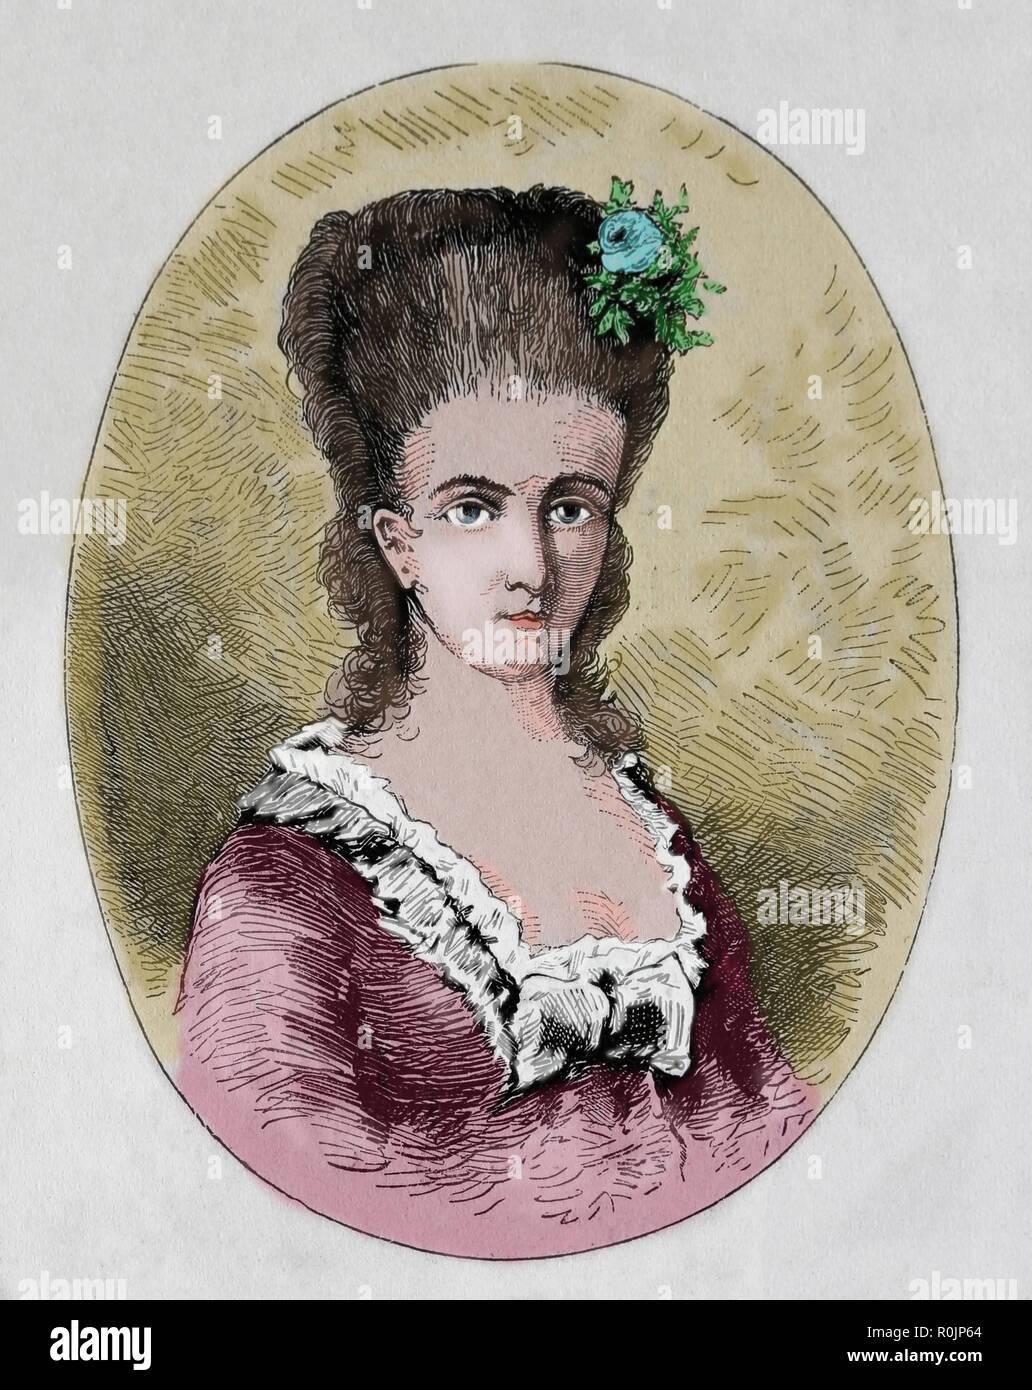 Charlote von Kalb (1761-1843). German writer, associated with Schiller, Goethe, Jean Paul and Holderlin. Engraving, 1882. - Stock Image